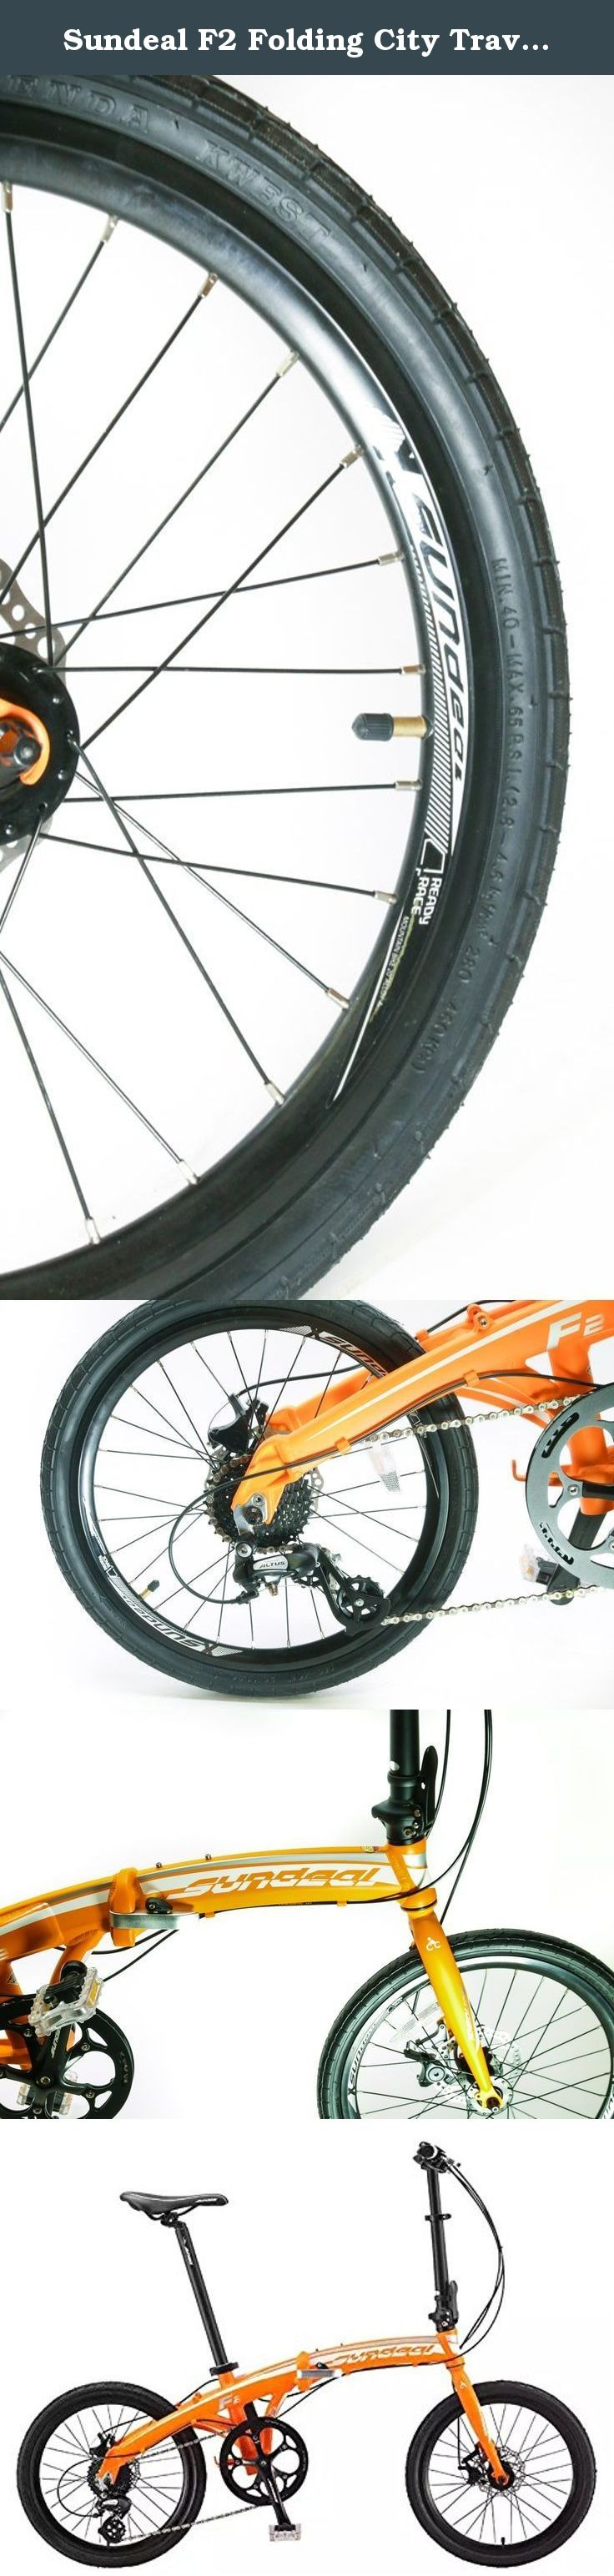 Sundeal F2 Folding City Travel Alloy Bike 20\